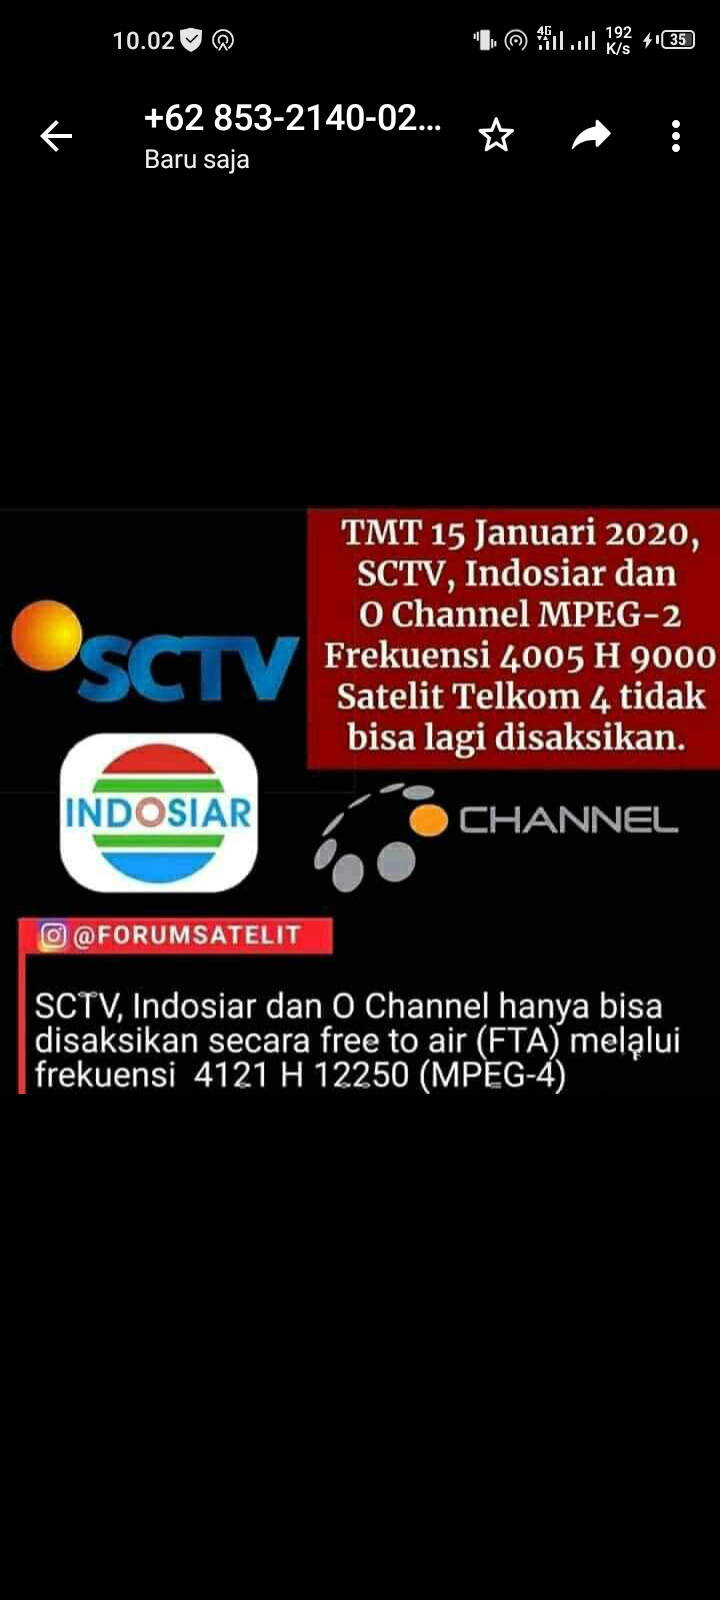 Frekuensi Sctv Baru : frekuensi, Frekuensi, Indosiar,, Pindah, Channel, 12250, MPEG4, Telkom, C-Band, Mulai, Januari, Aulaku